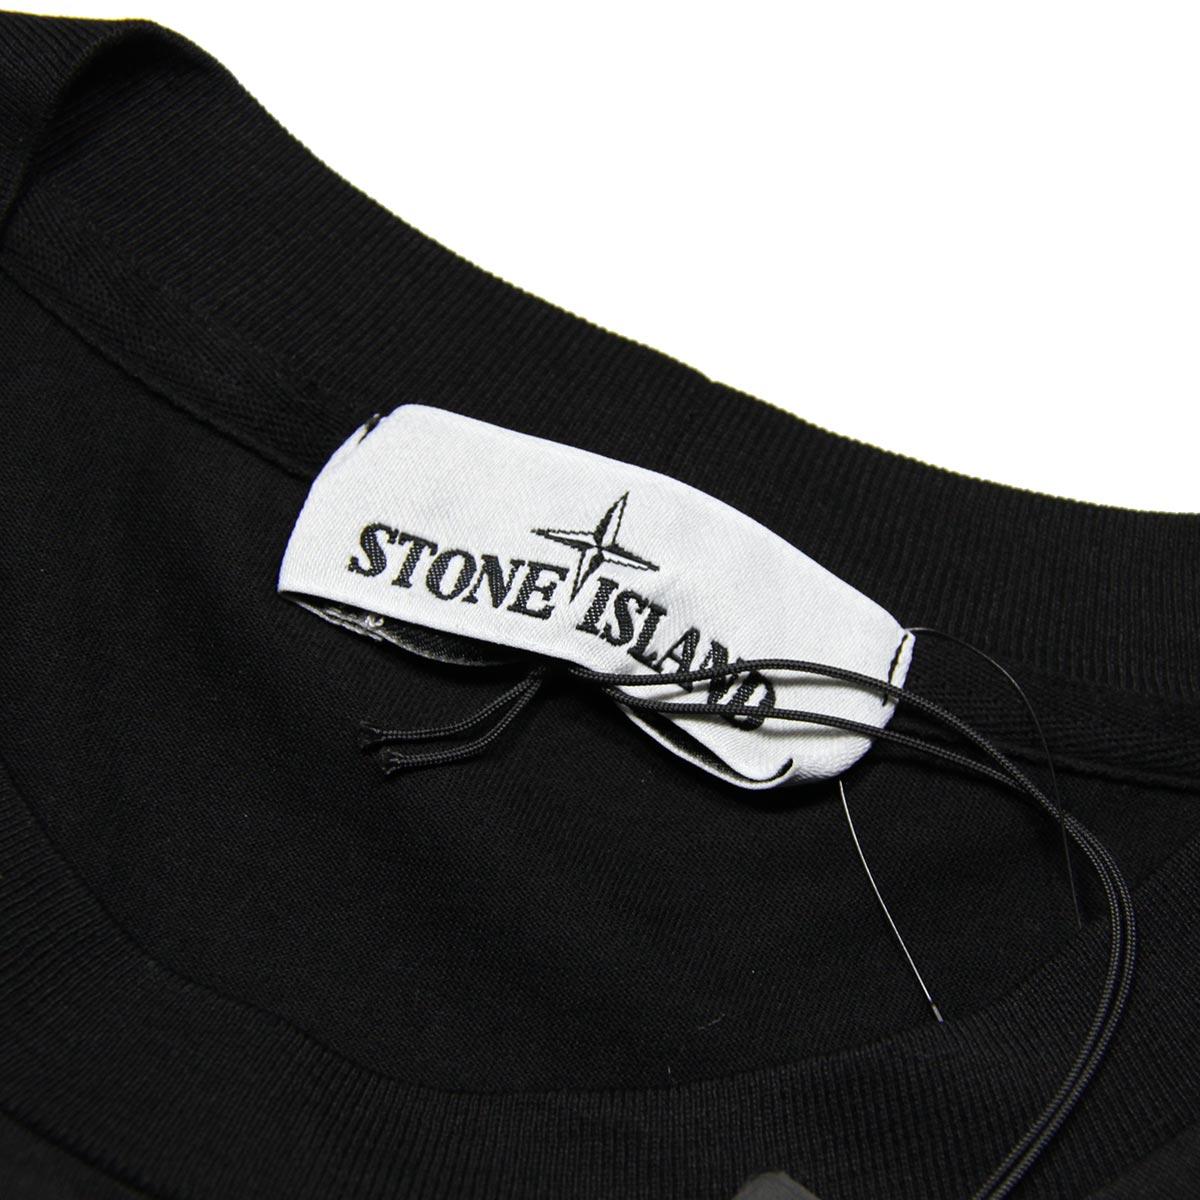 stone_island_1